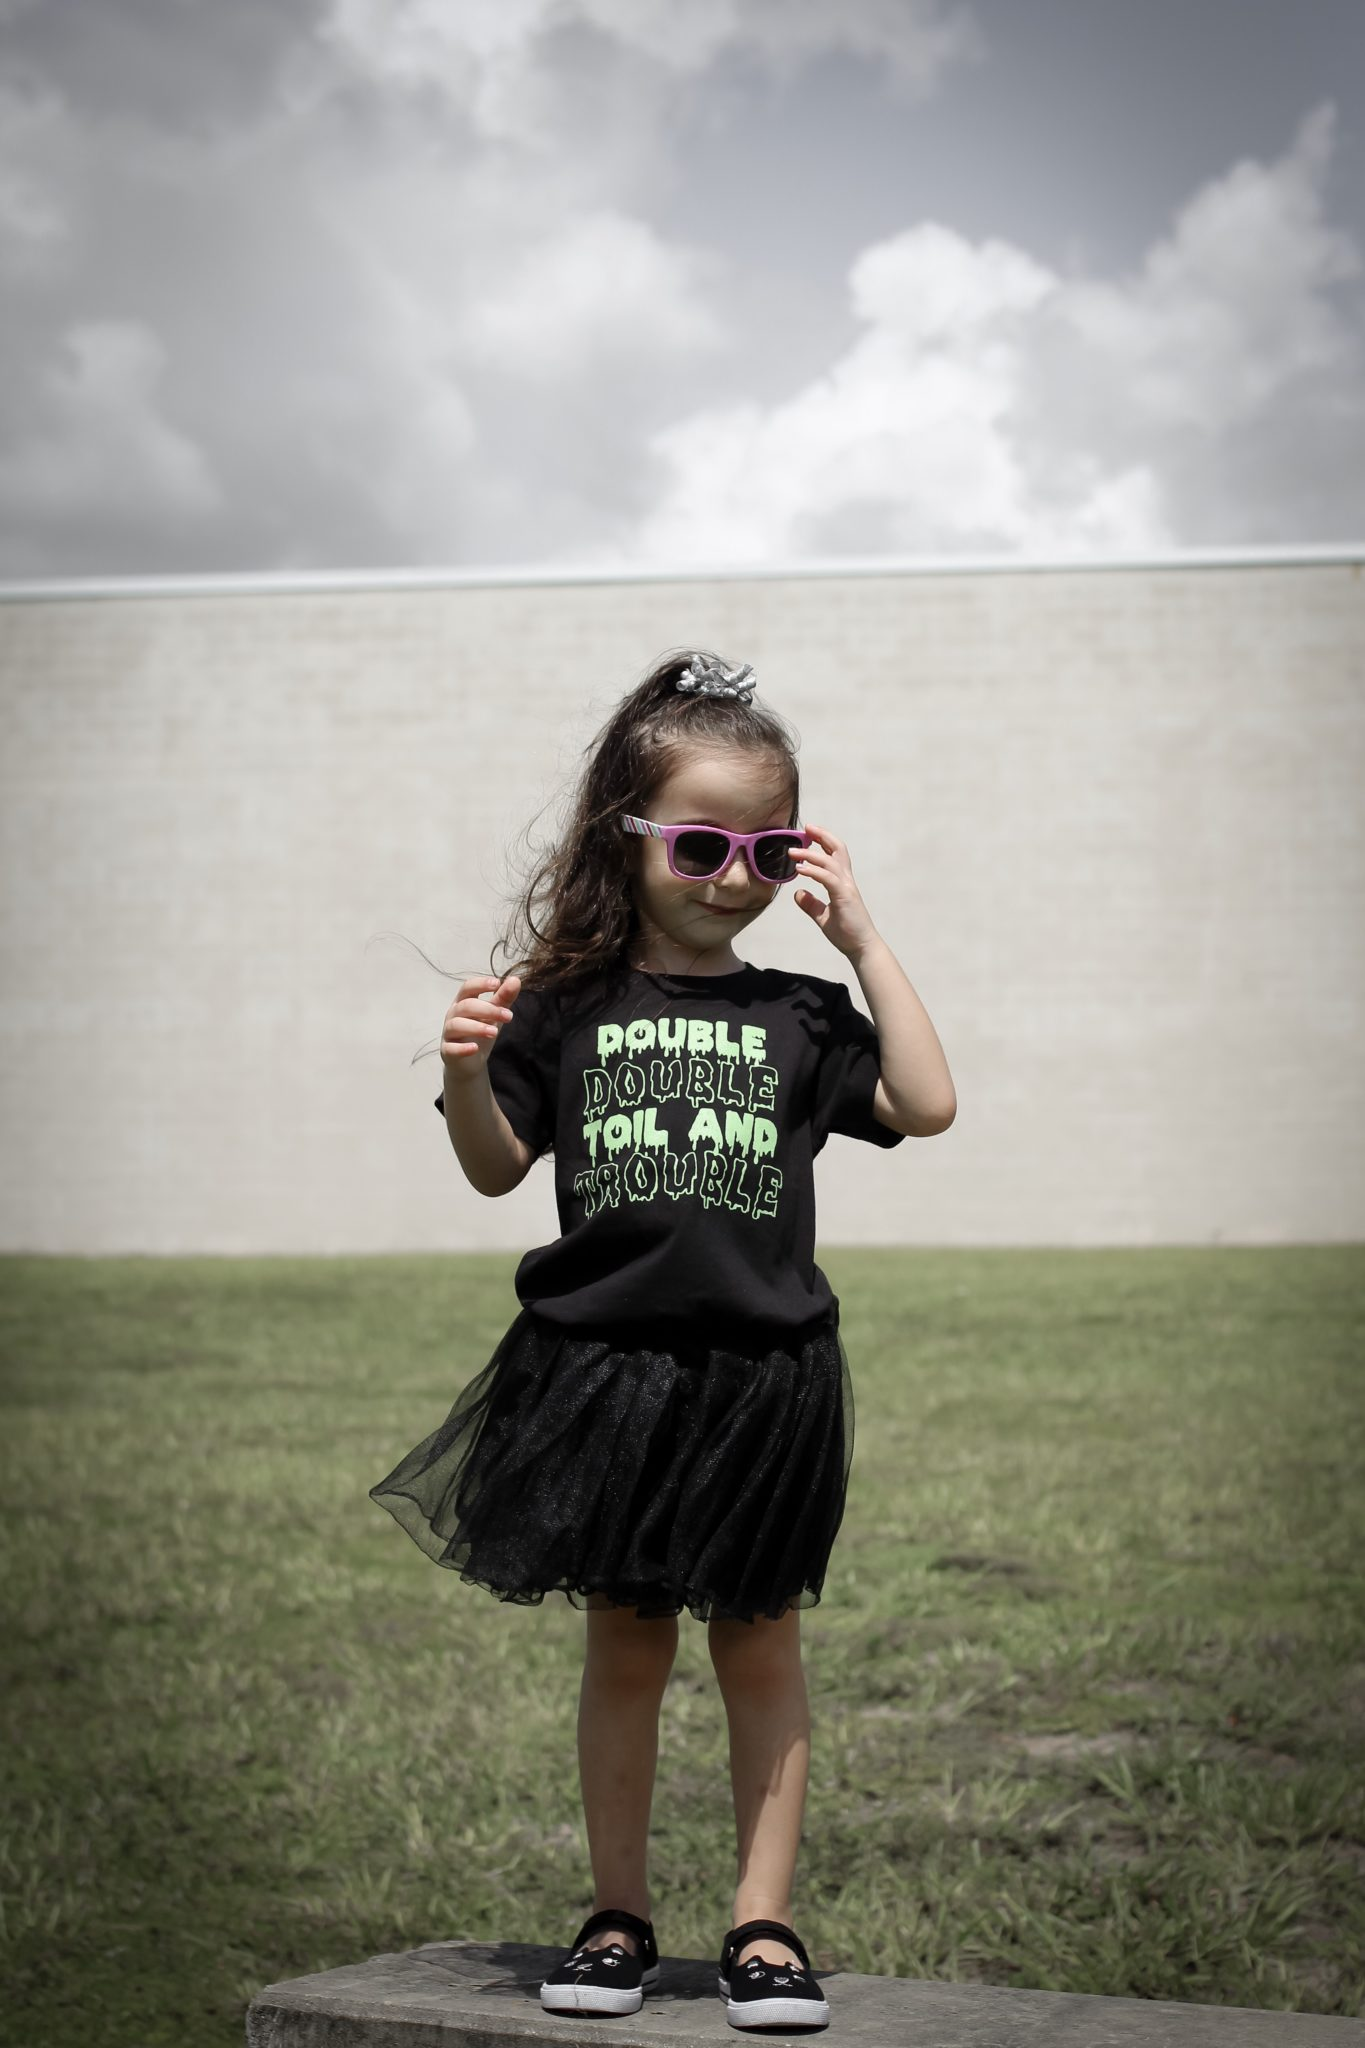 Halloween shirts, toddler girl Halloween shirt, funny Halloween shirts, womens Halloween shirts, small shop halloween, river babe threads halloween, moots clothing halloween, seriously happy tees halloween